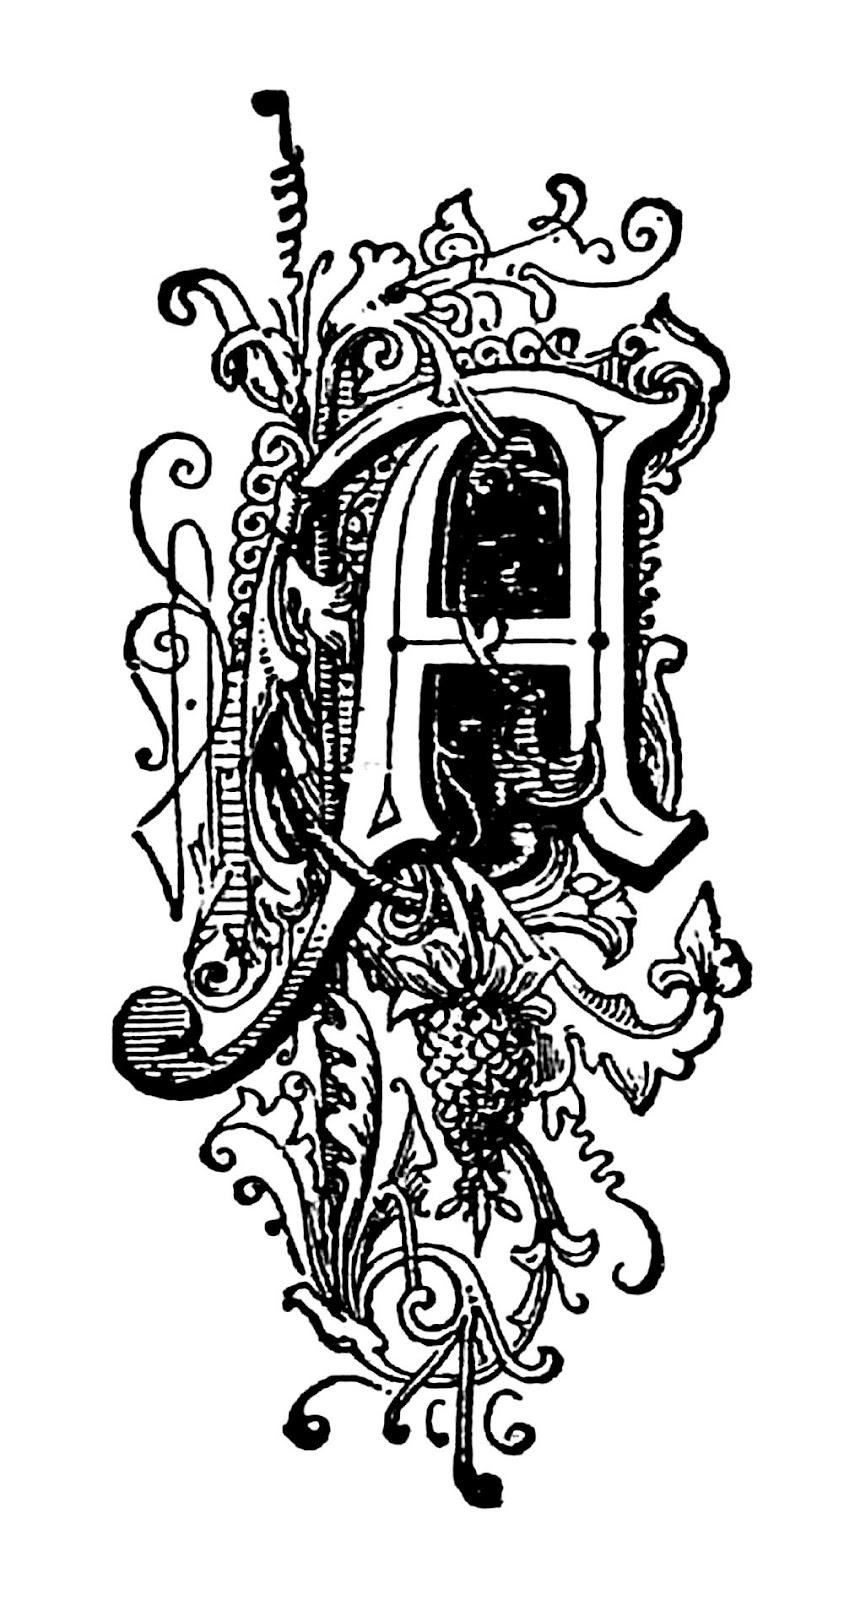 Antique Images: Free Black and White Illustration